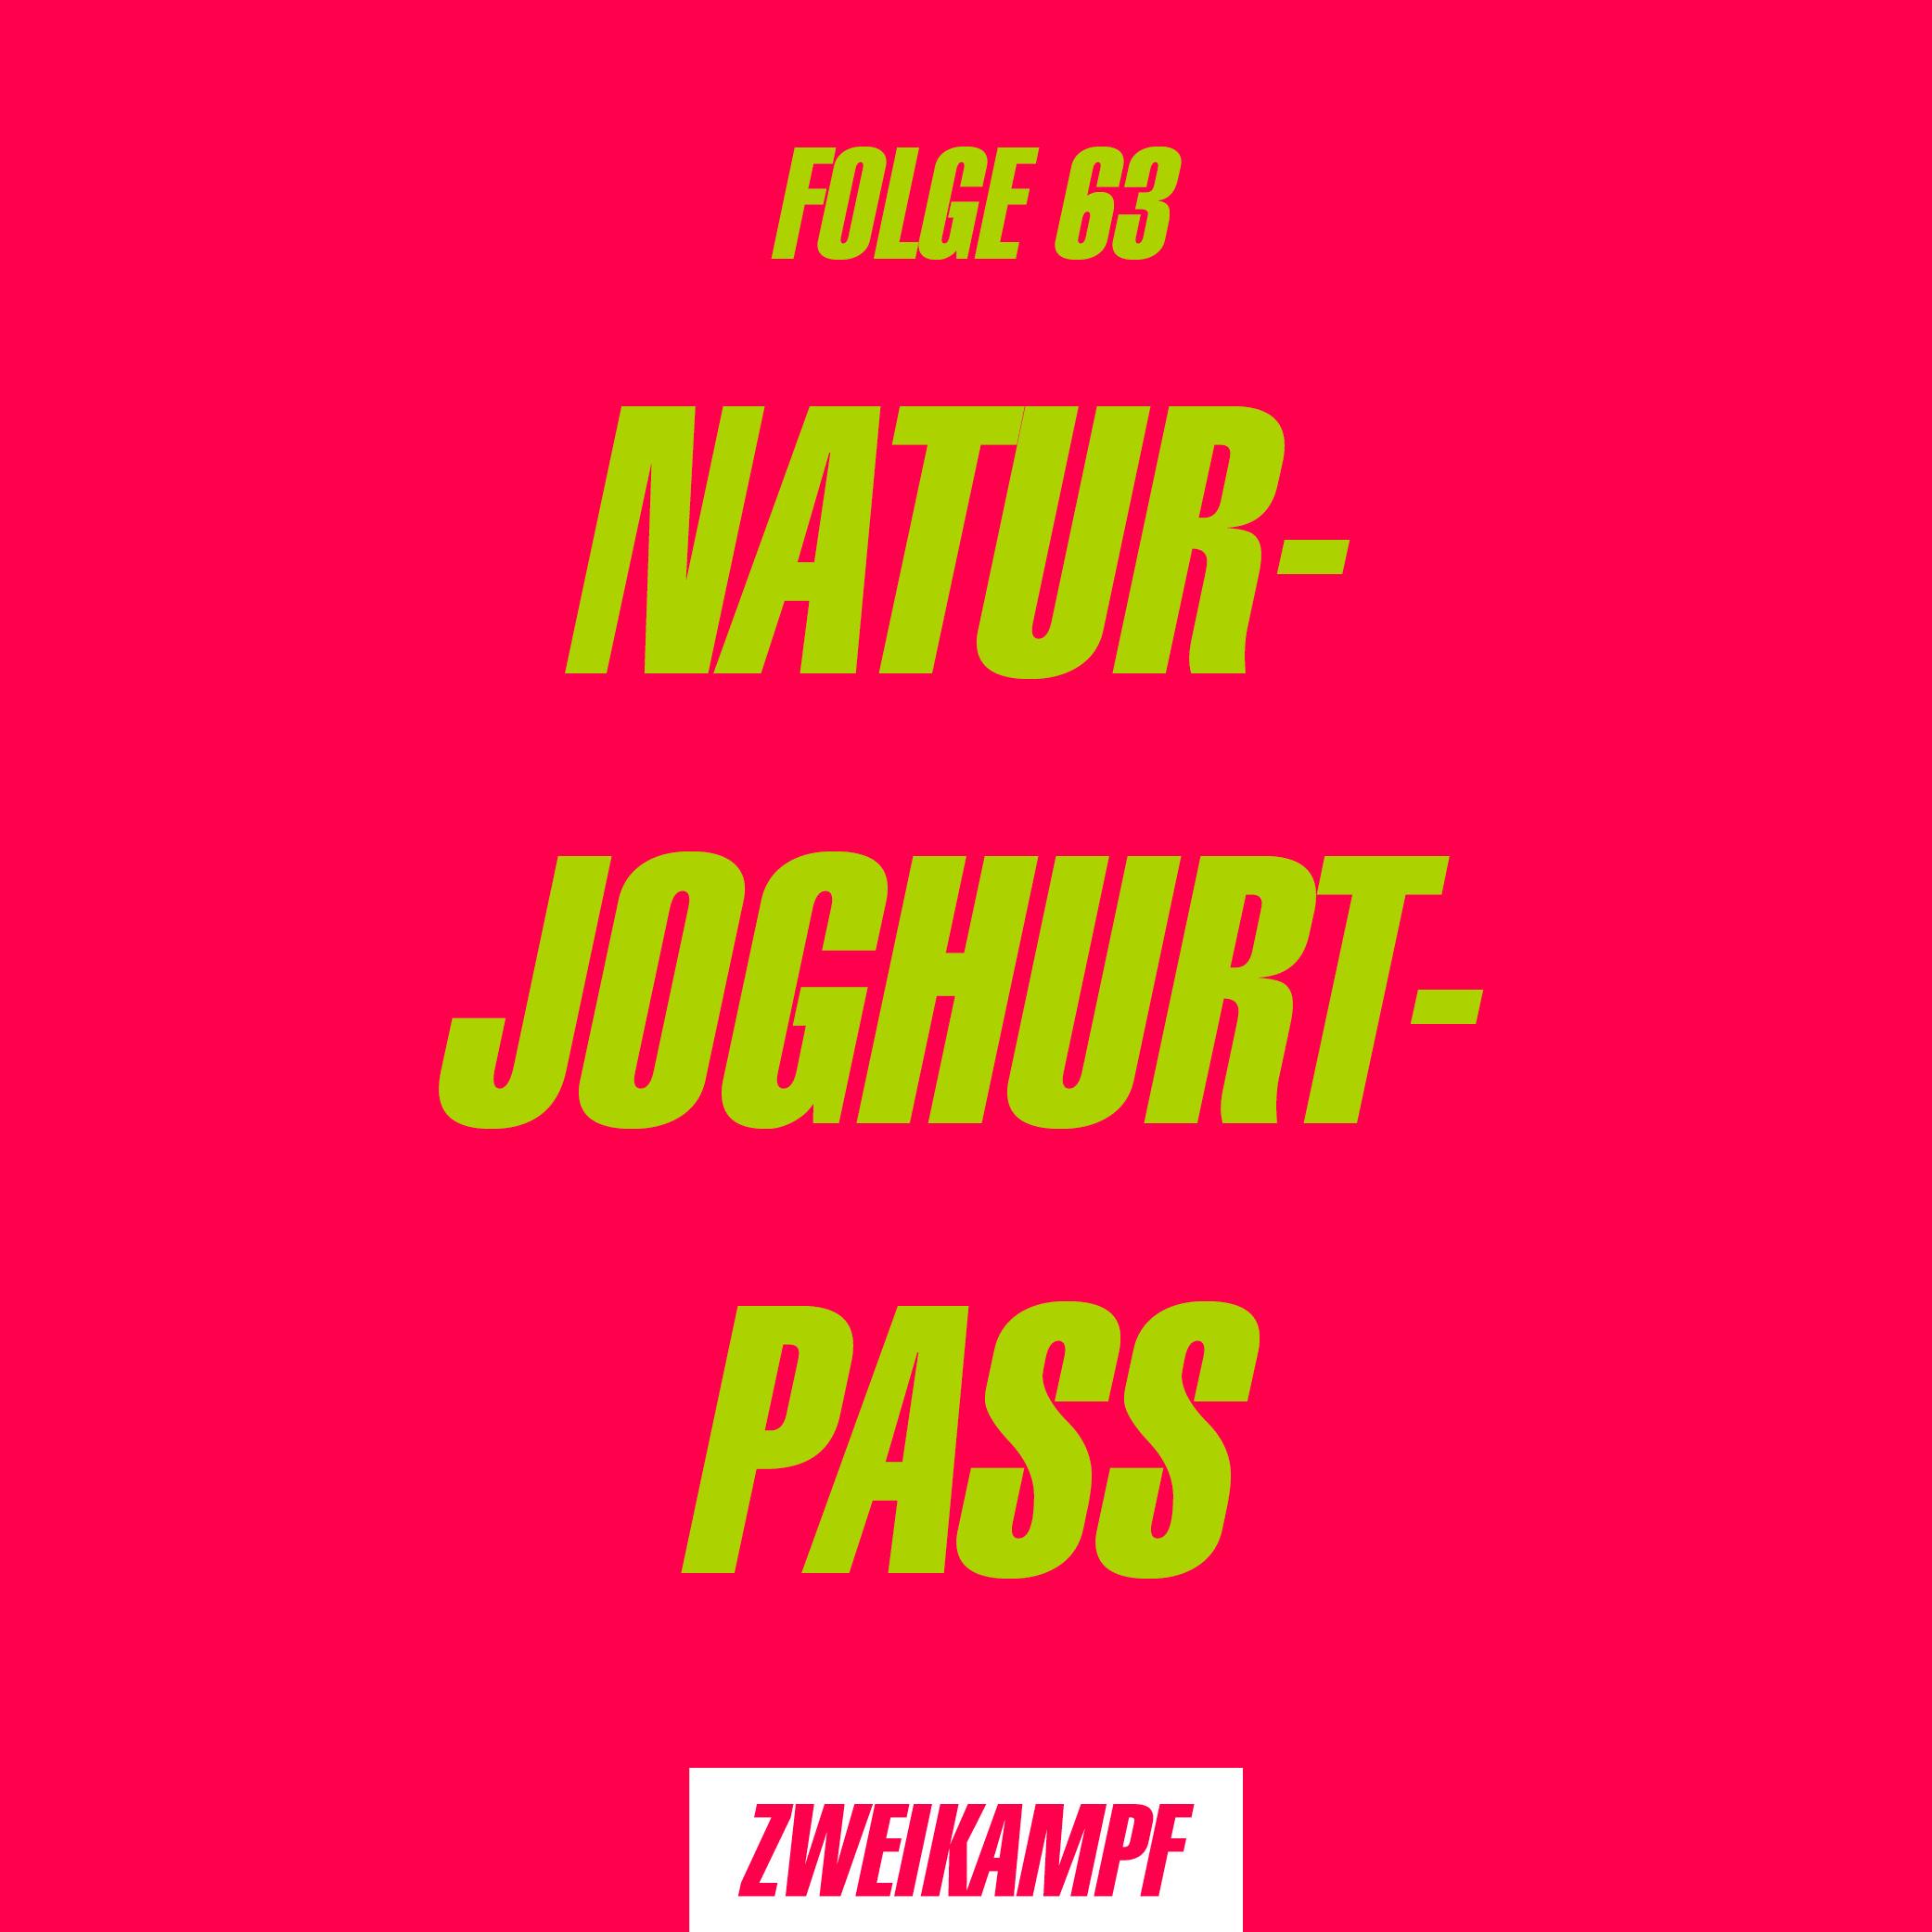 Folge 63: Naturjoghurtpass